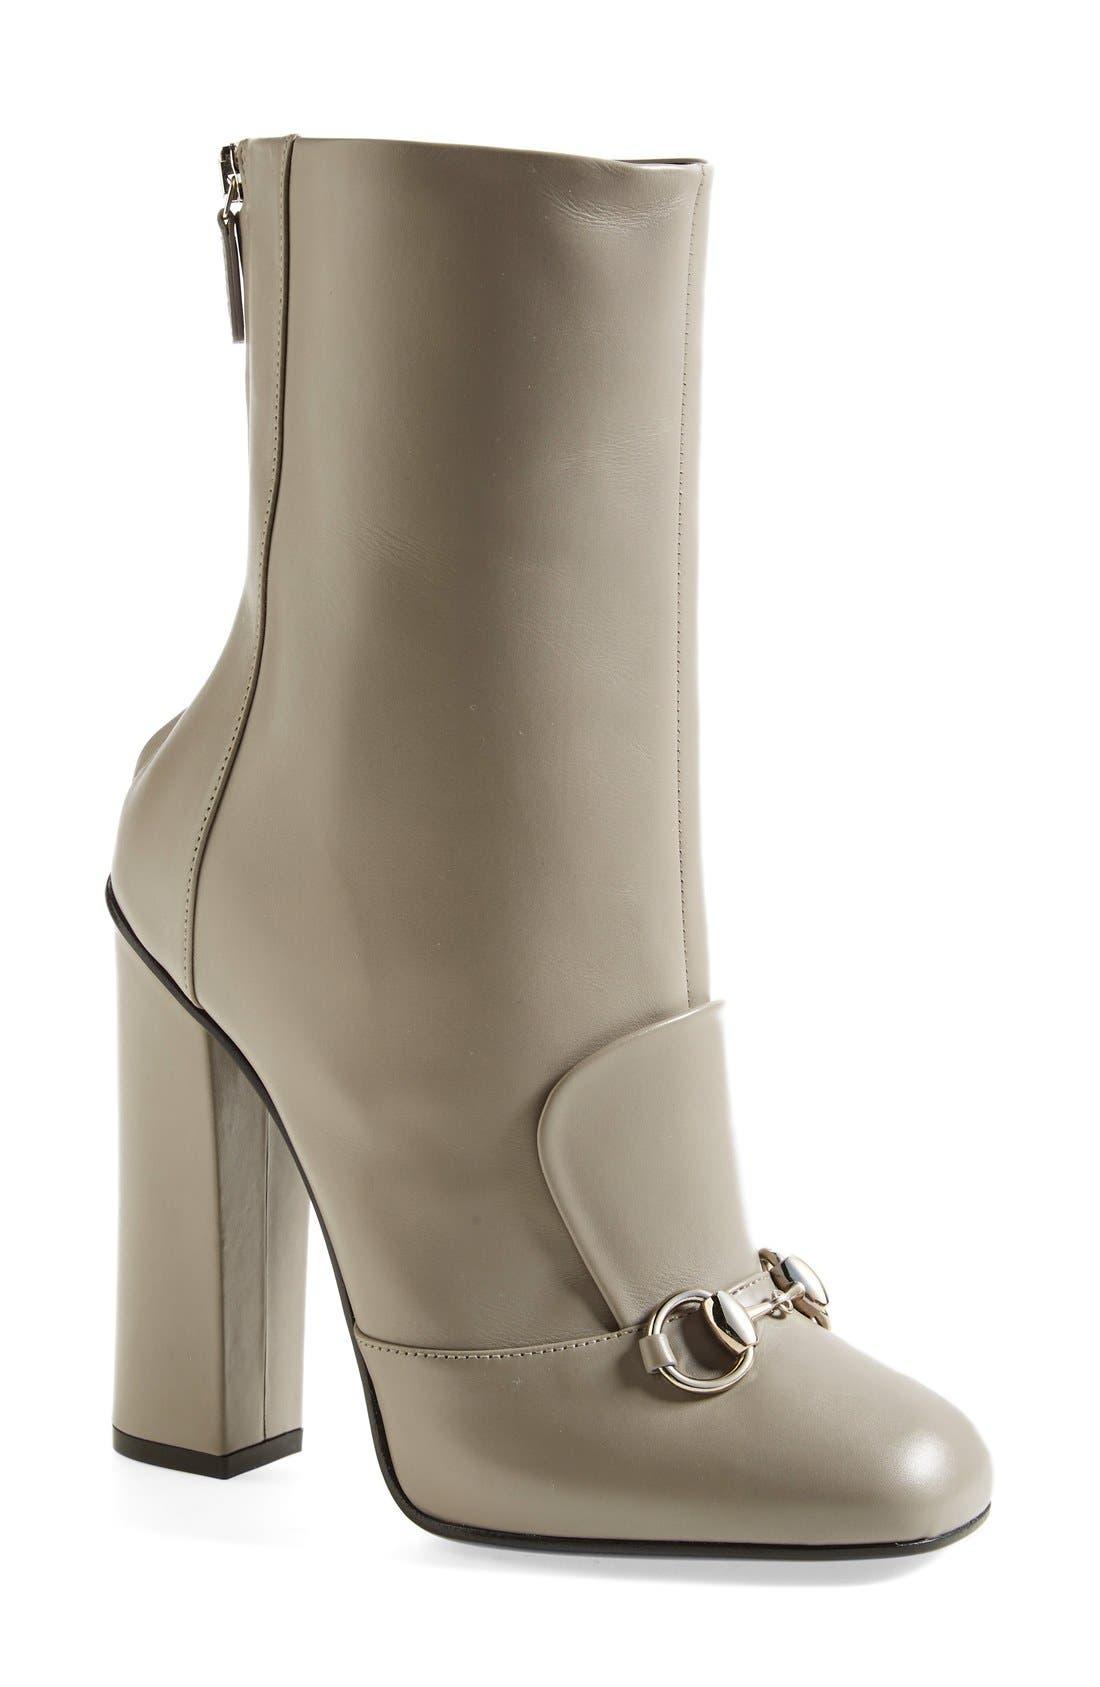 Alternate Image 1 Selected - Gucci 'Lillian' Bit Boot (Women)